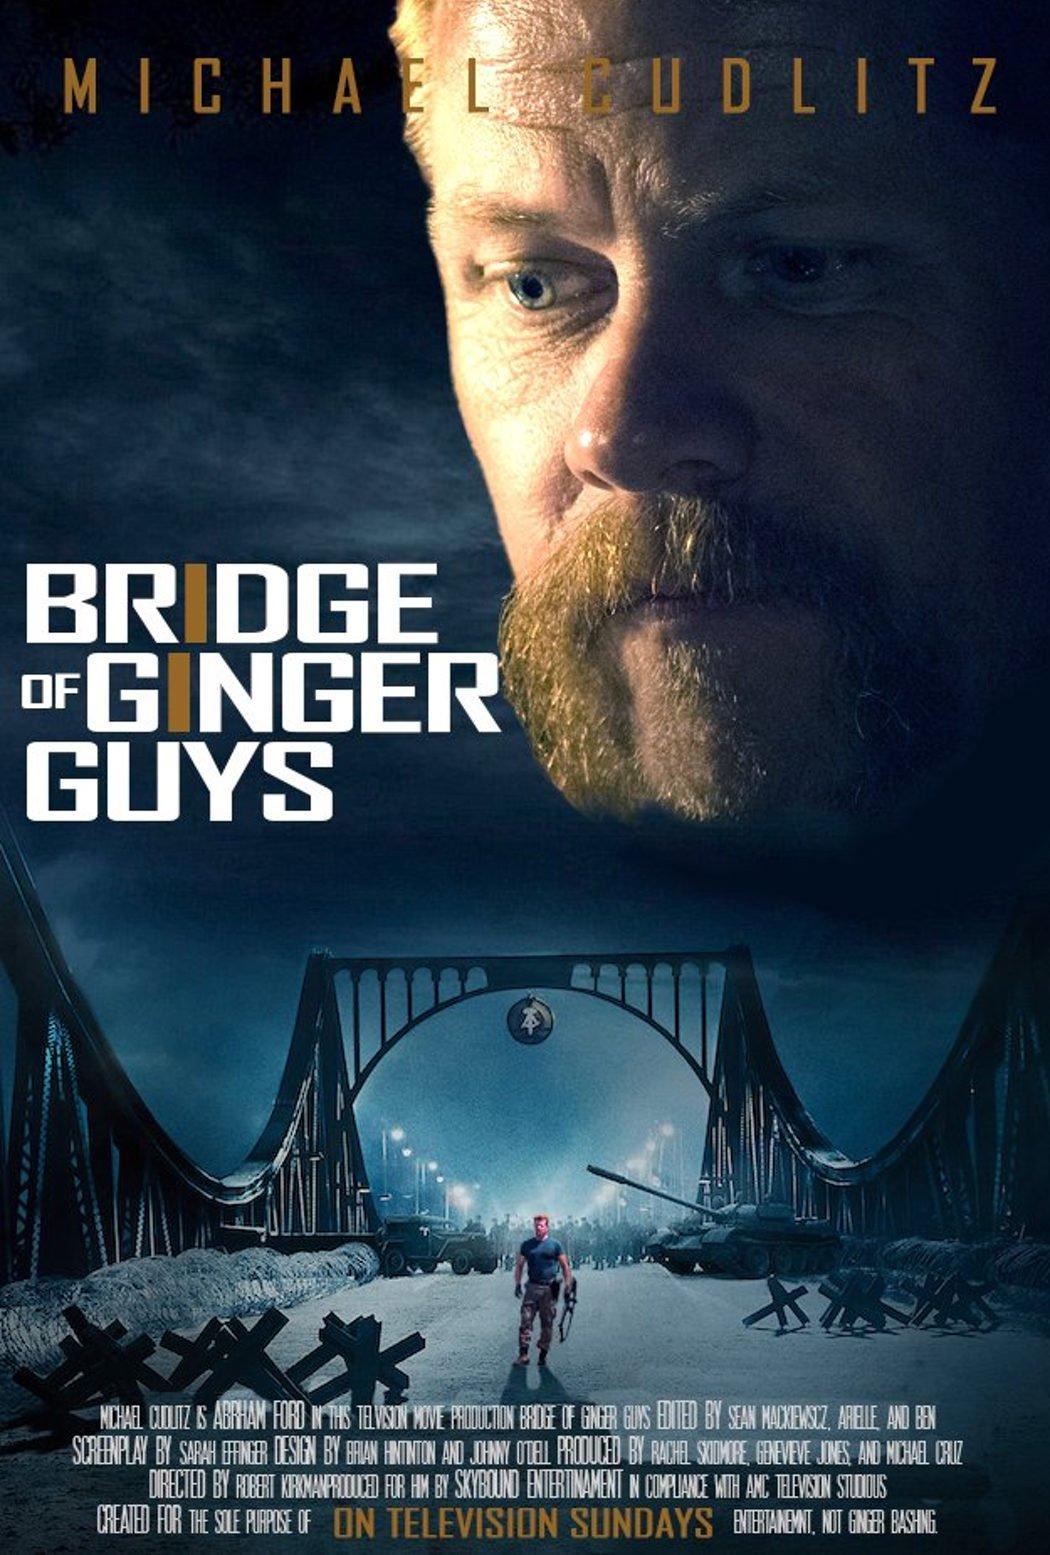 'Bridge of Ginger Guys'